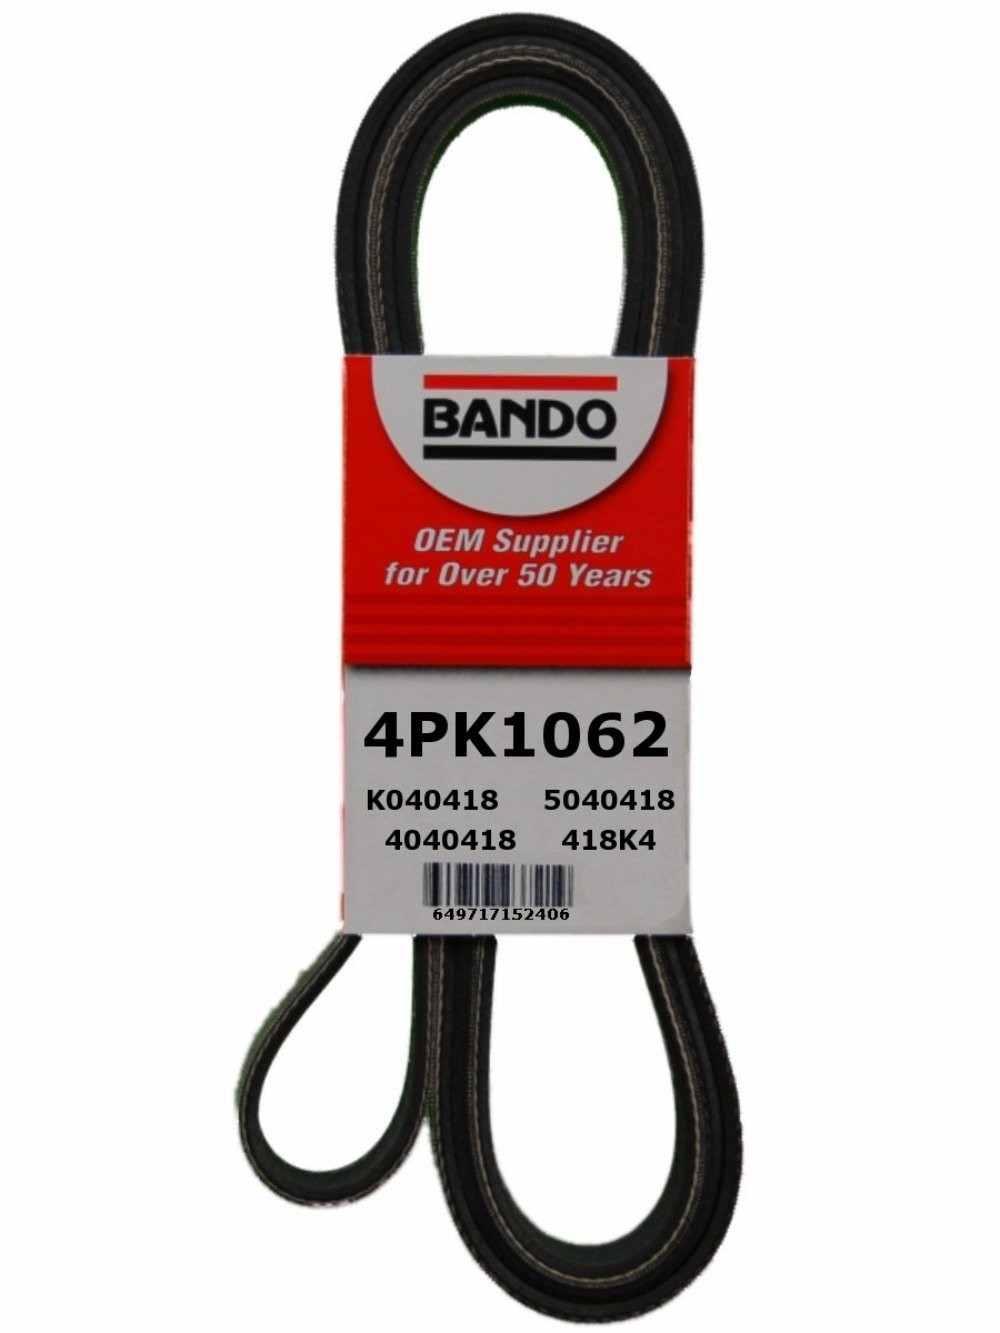 BANDO - Rib Ace Precision Engineered V-Ribbed Belt (Compressor) - BWO 4PK1062